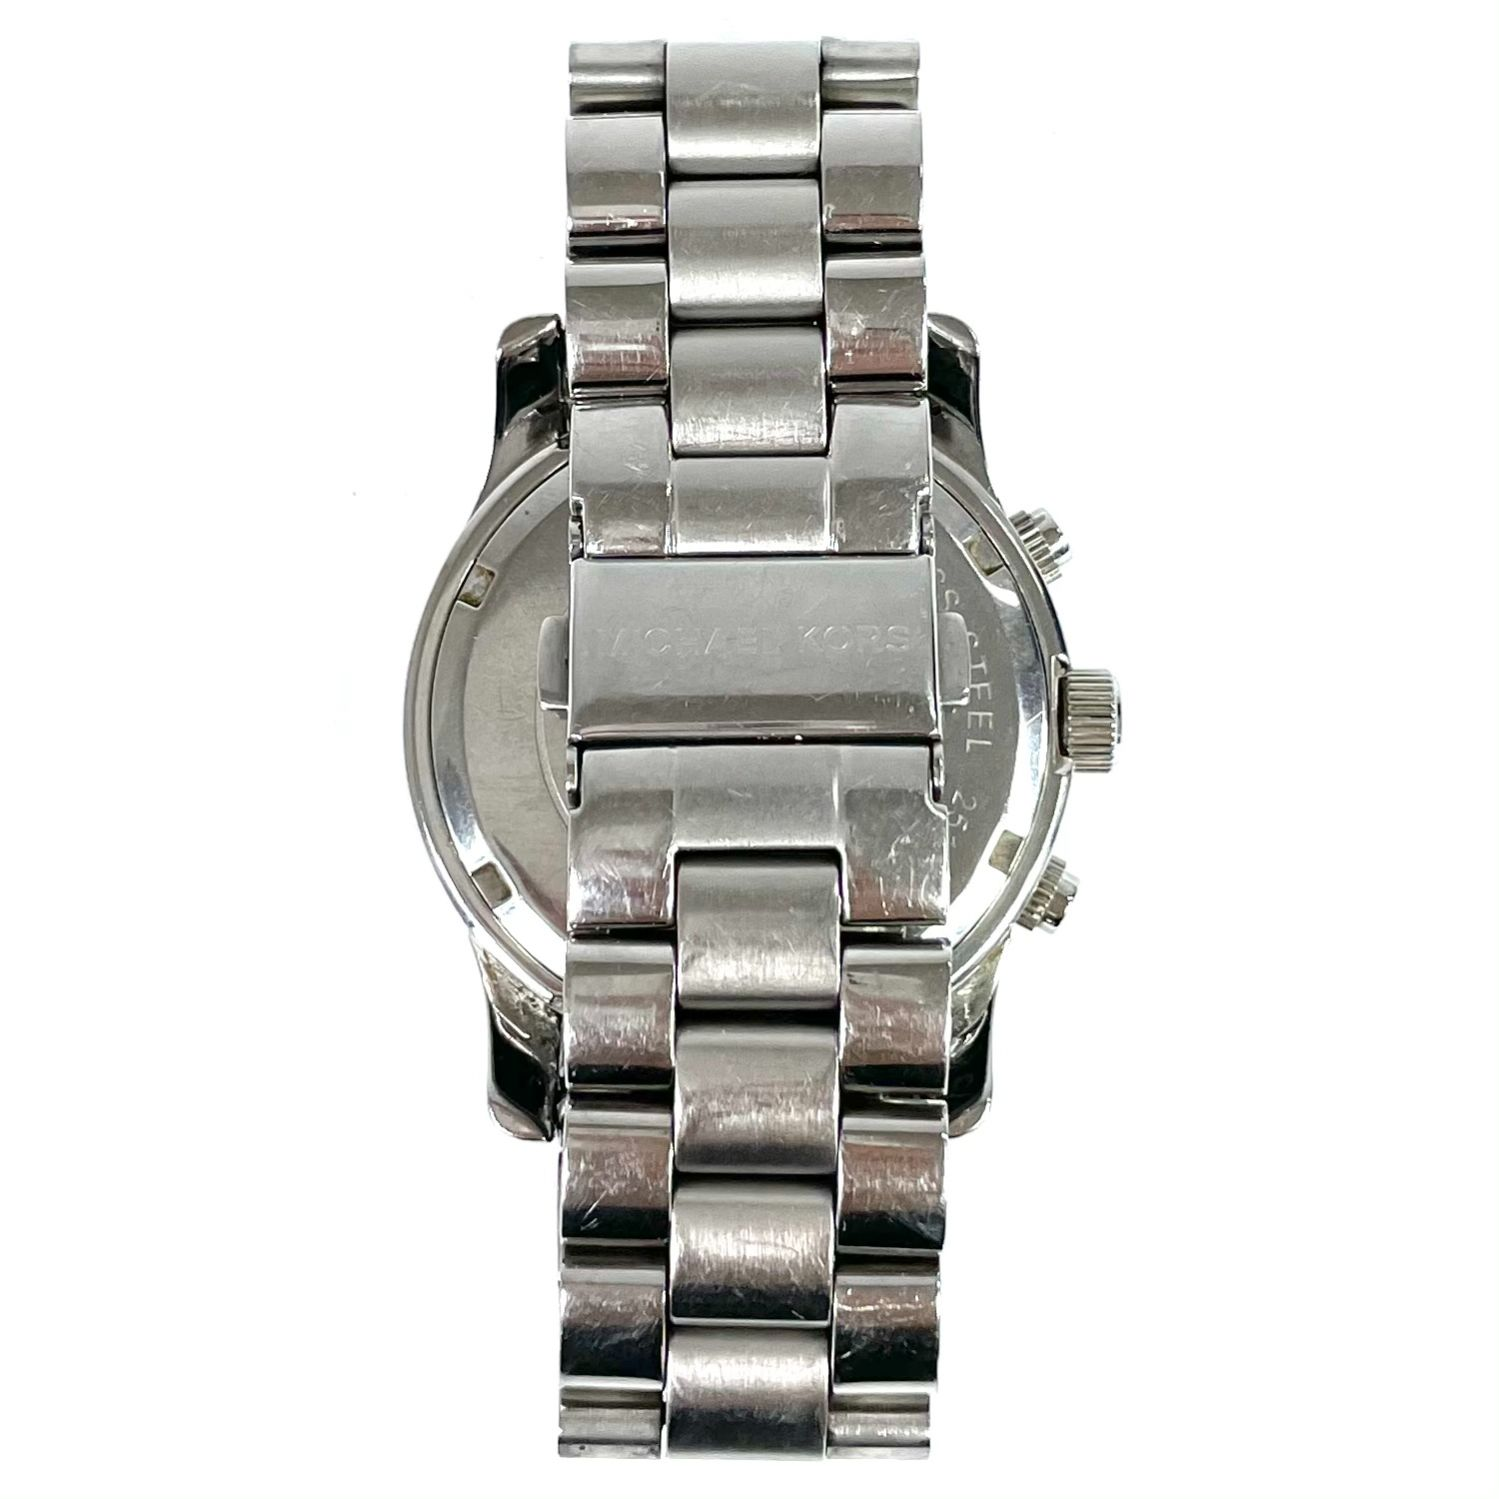 Relógio Michael Kors MK 5076 Prateado